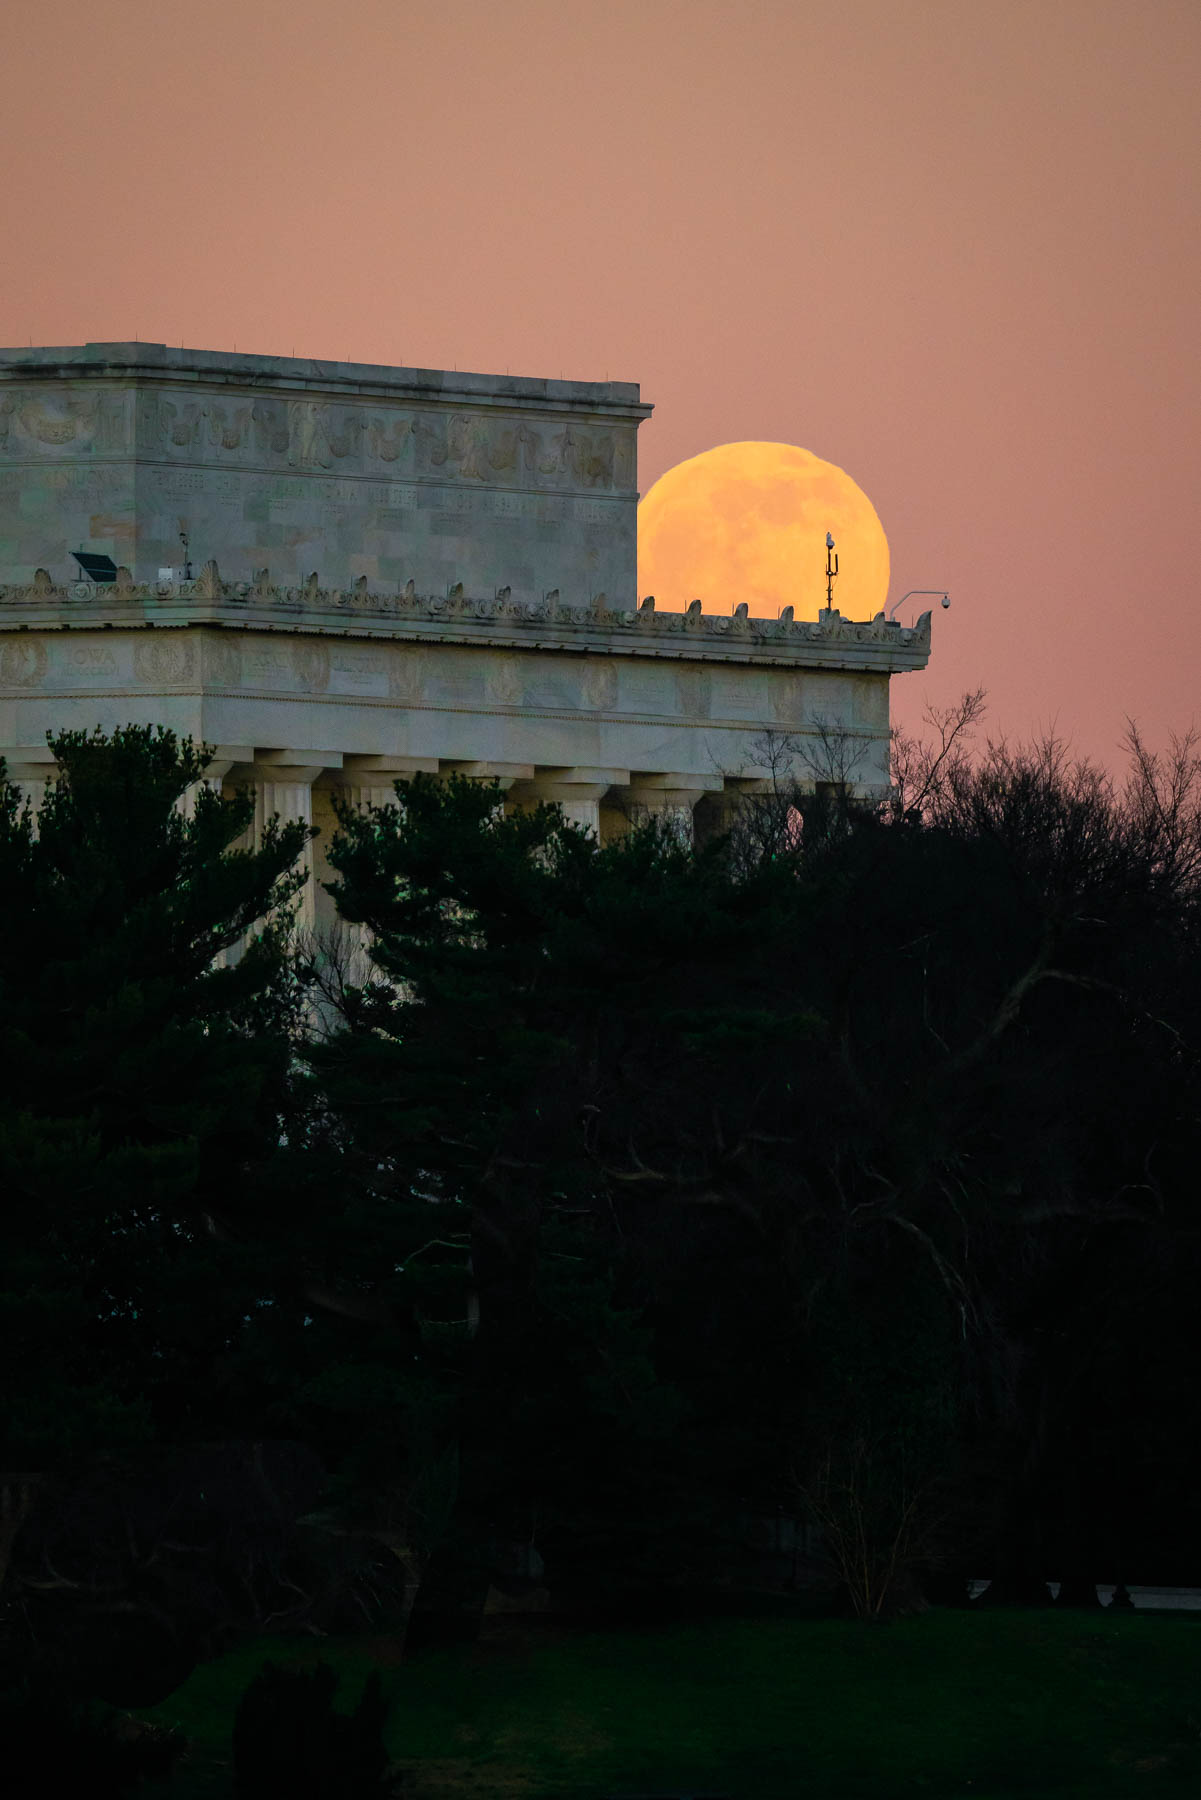 lincoln memorial, long exposure, night photography, arlington memorial bridge, lincoln memorial, washington dc, full moon, mt vernon trail